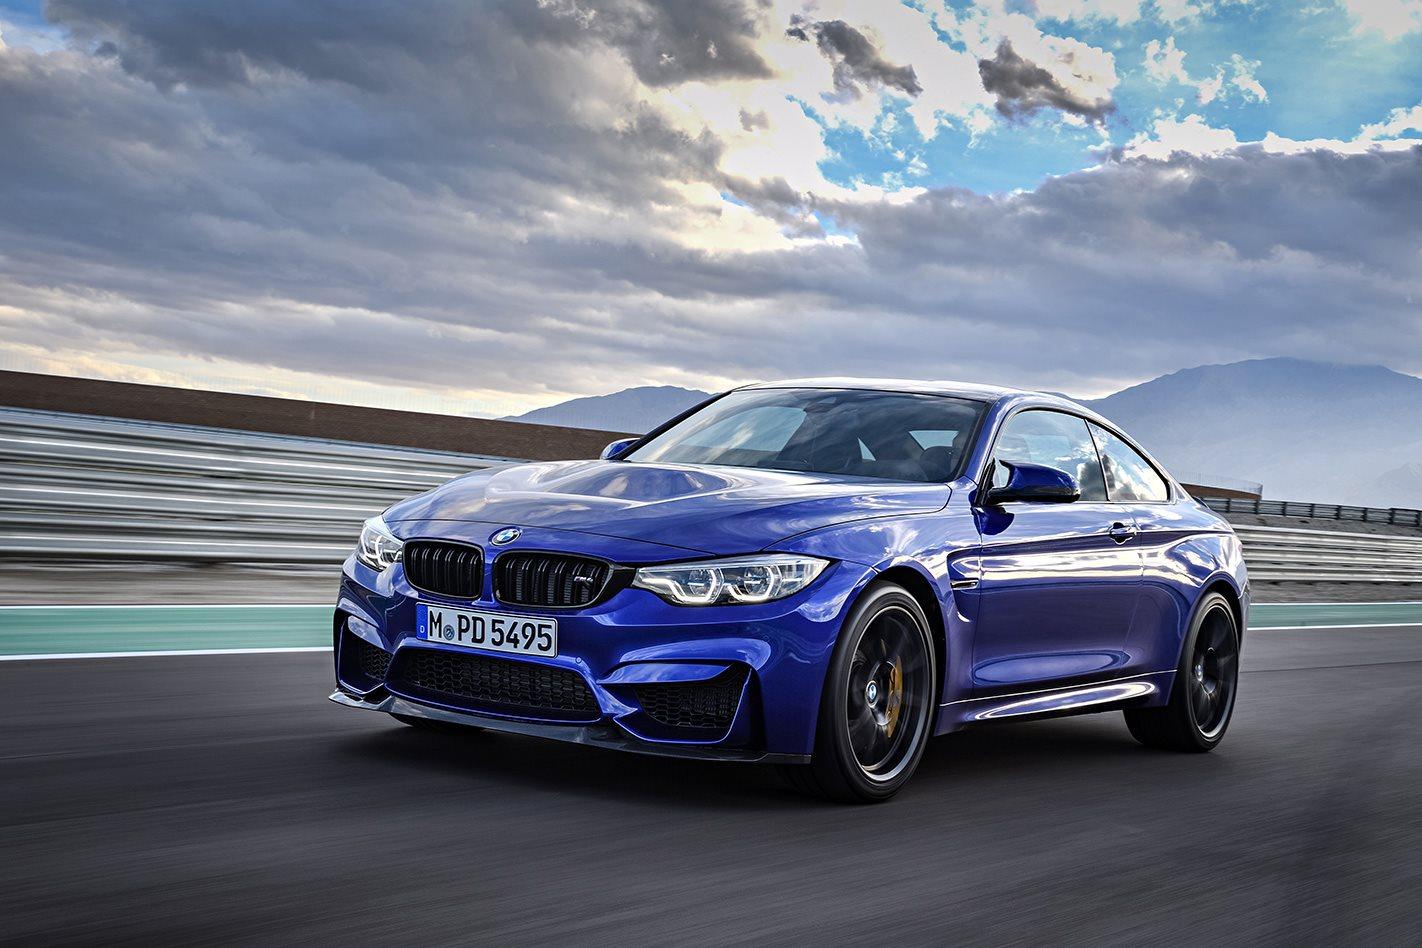 2018 BMW M4 CS drive